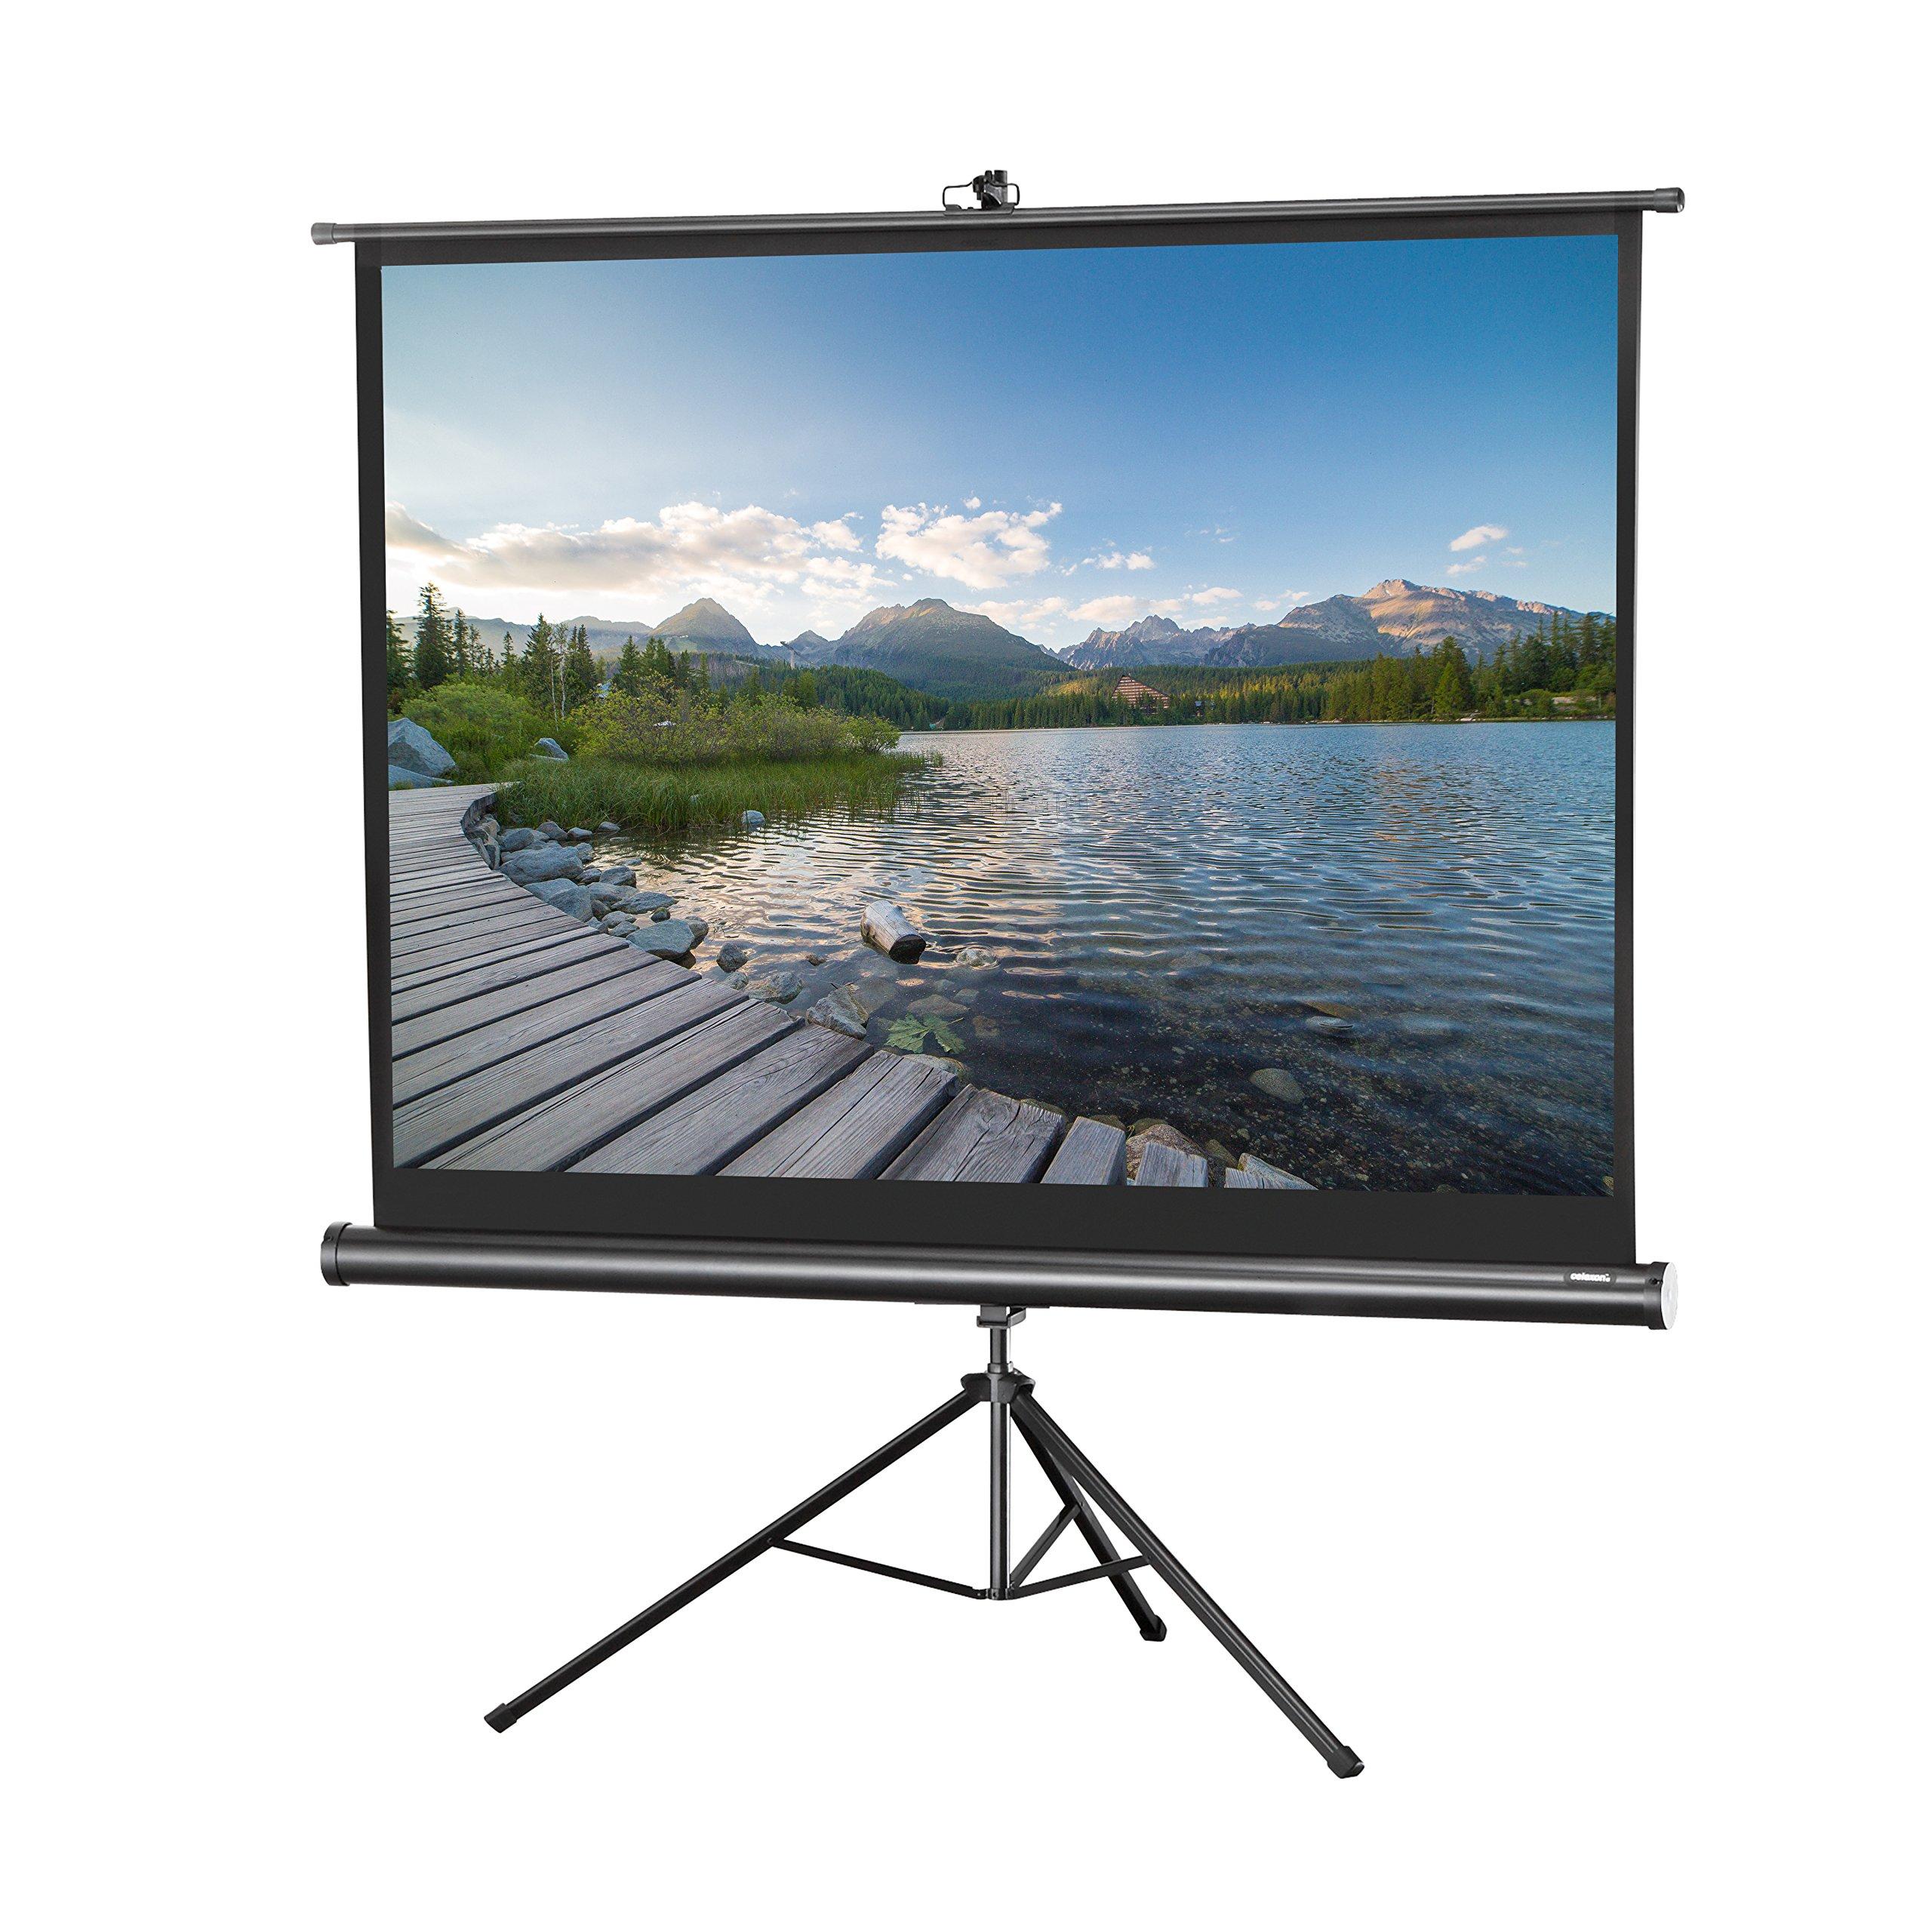 celexon 120'' Tripod Projector Screen Tripod Economy, 96 x 72 inches viewing area, 4:3 format, Black edition